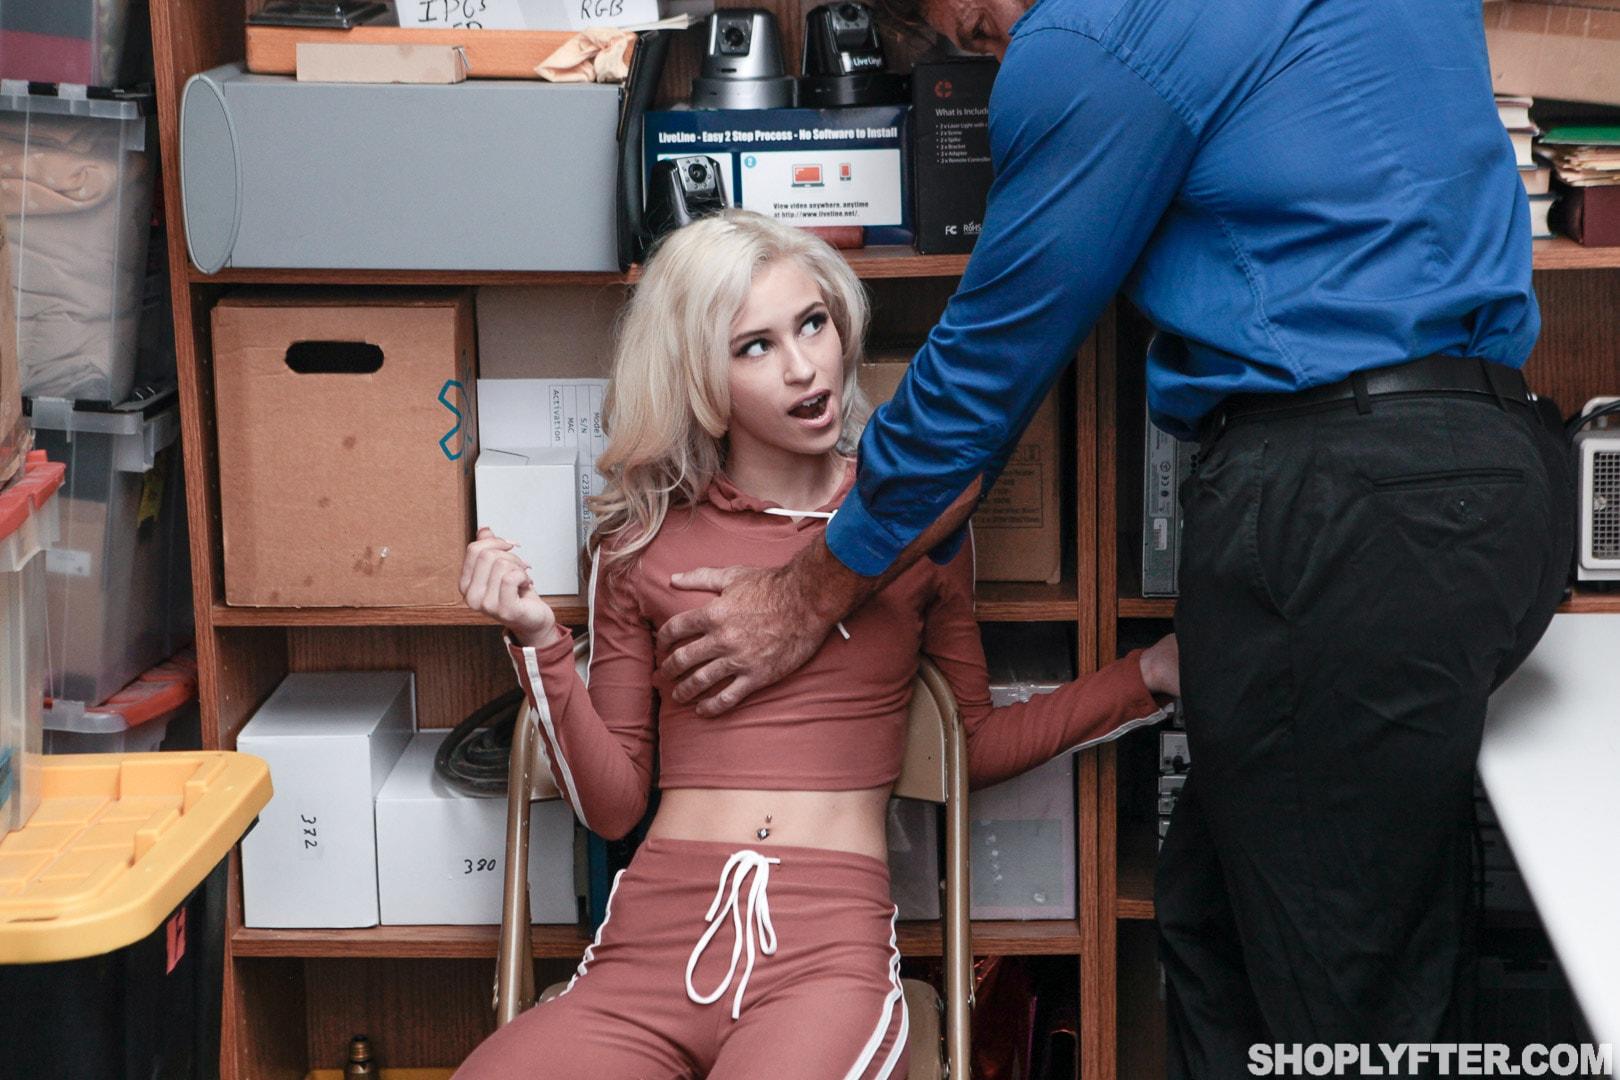 Team Skeet 'Case No. 111392' starring Kiara Cole (Photo 4)